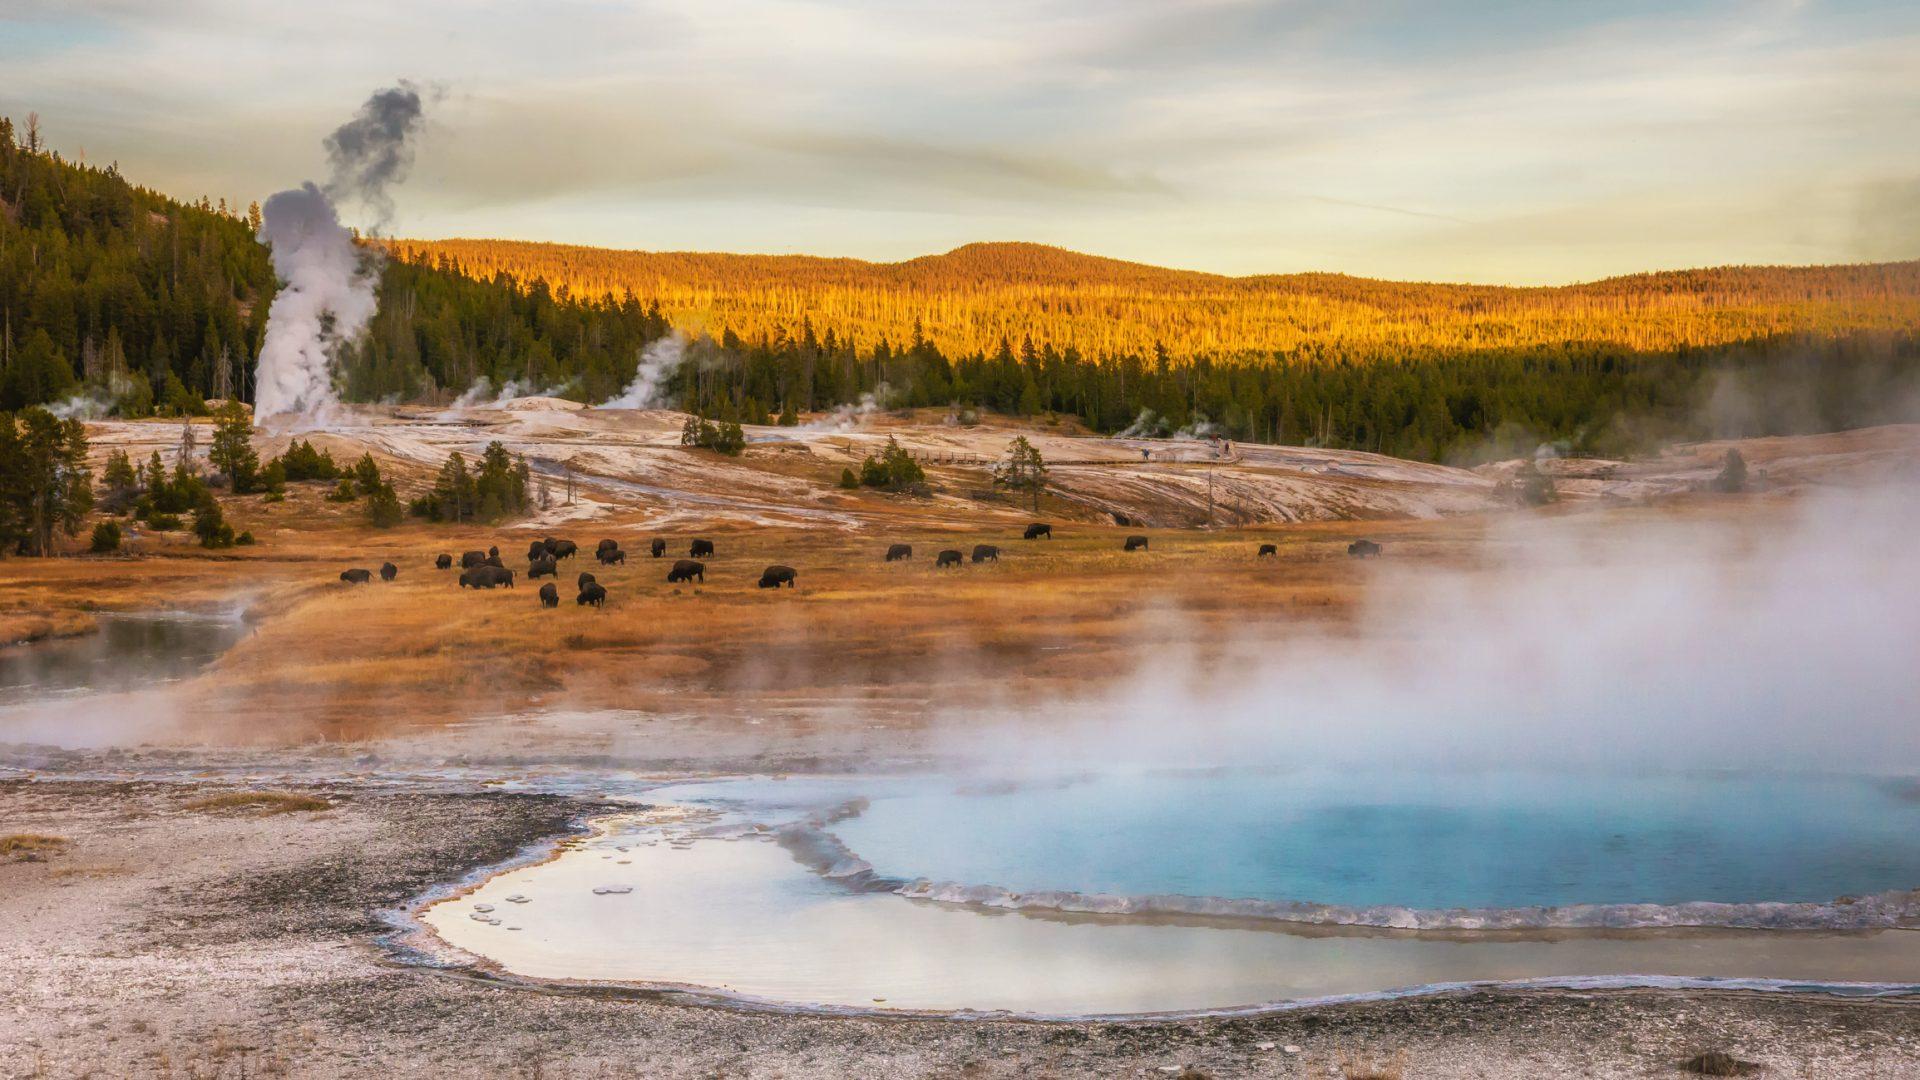 Geysers, Yellowstone National Park, Wyoming, USA.